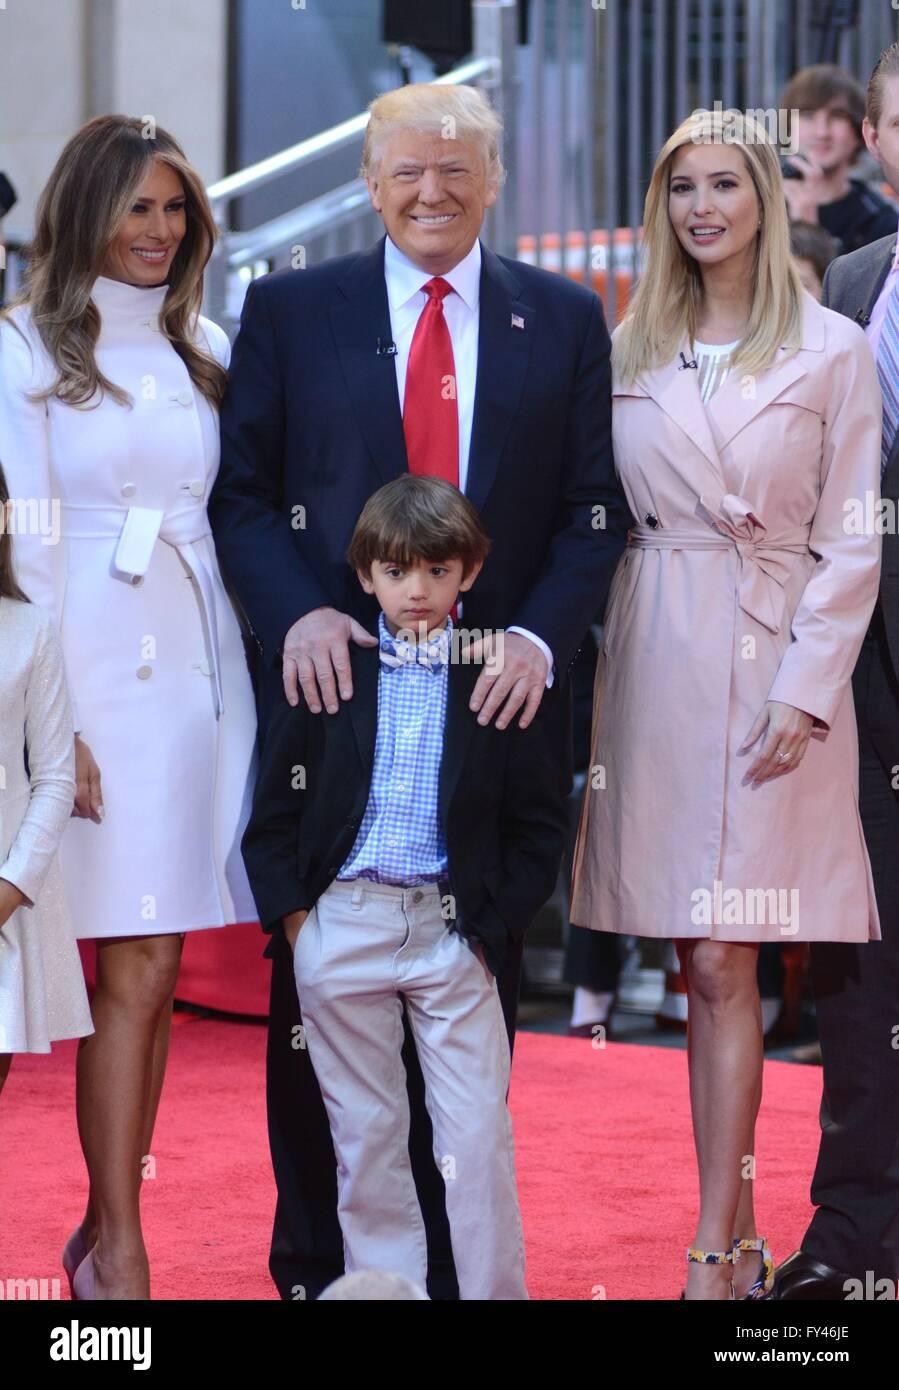 Trump 21 World Depicted As Greek Deity Gaia From: New York, Ny, Usa. 21st Apr, 2016. Melania Knauss Trump